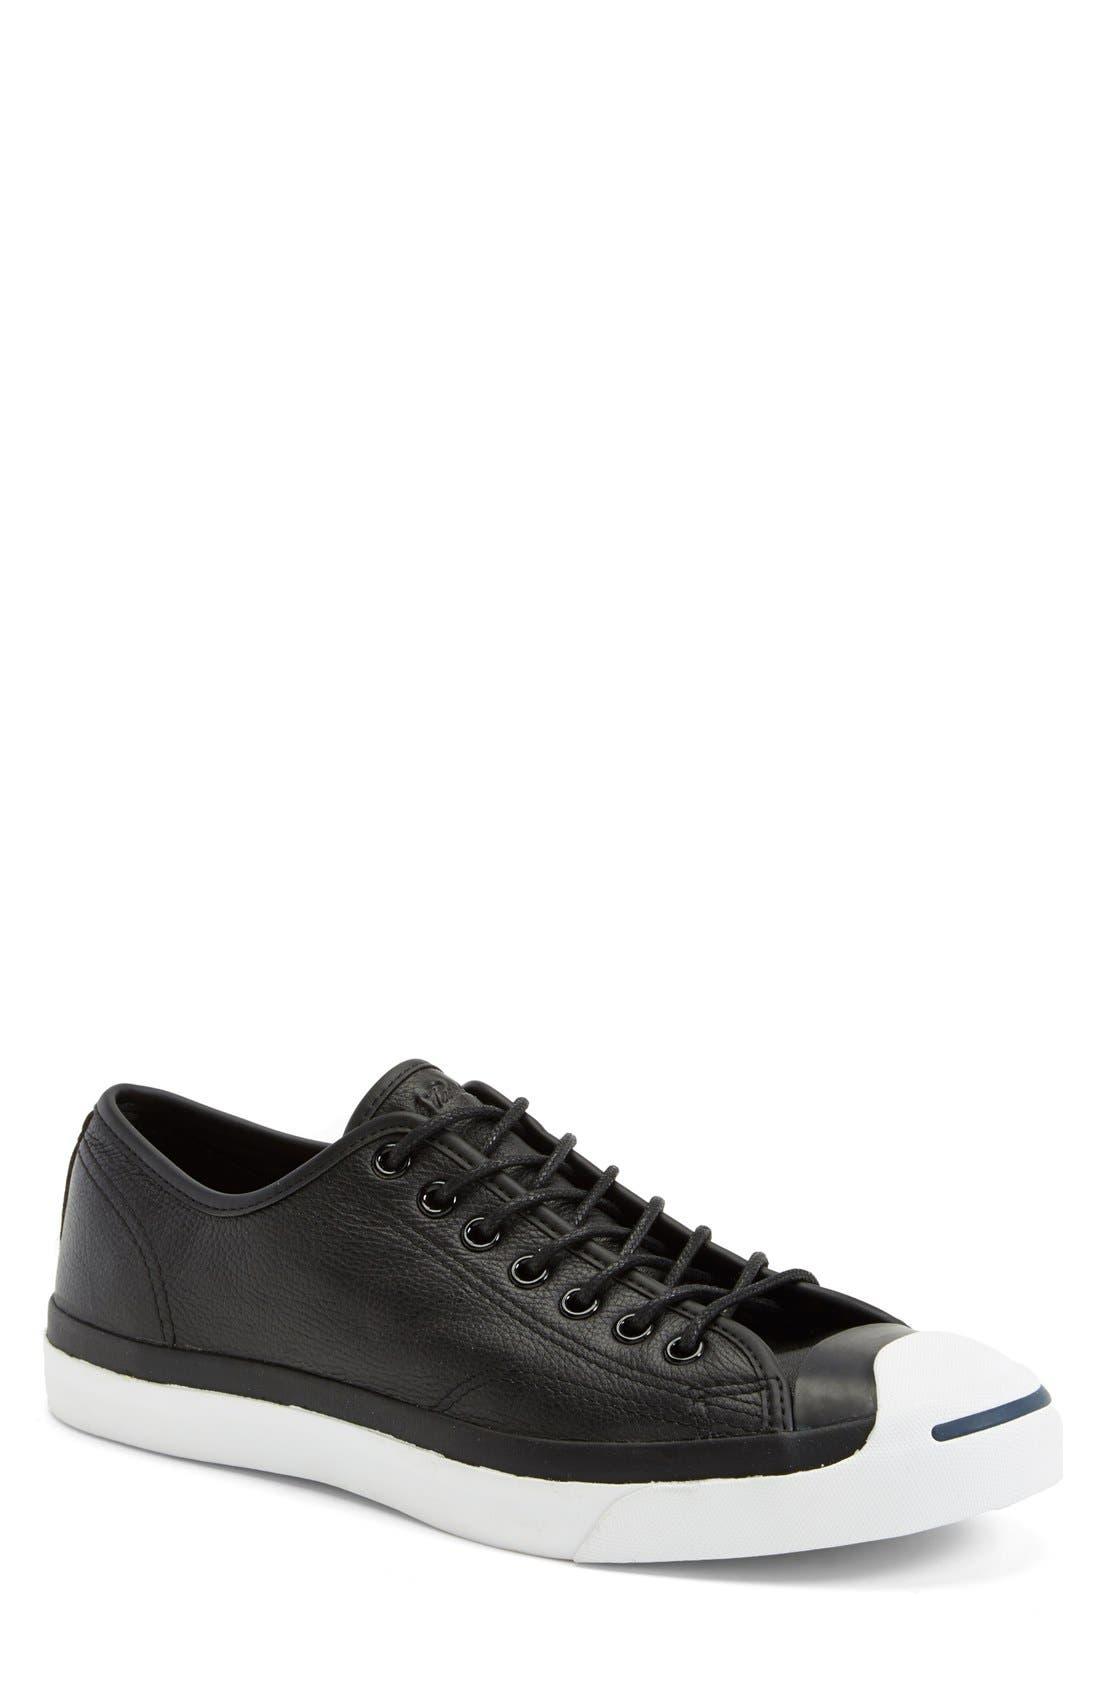 Alternate Image 1 Selected - Converse 'Jack Purcell - Jack' Sneaker (Men)